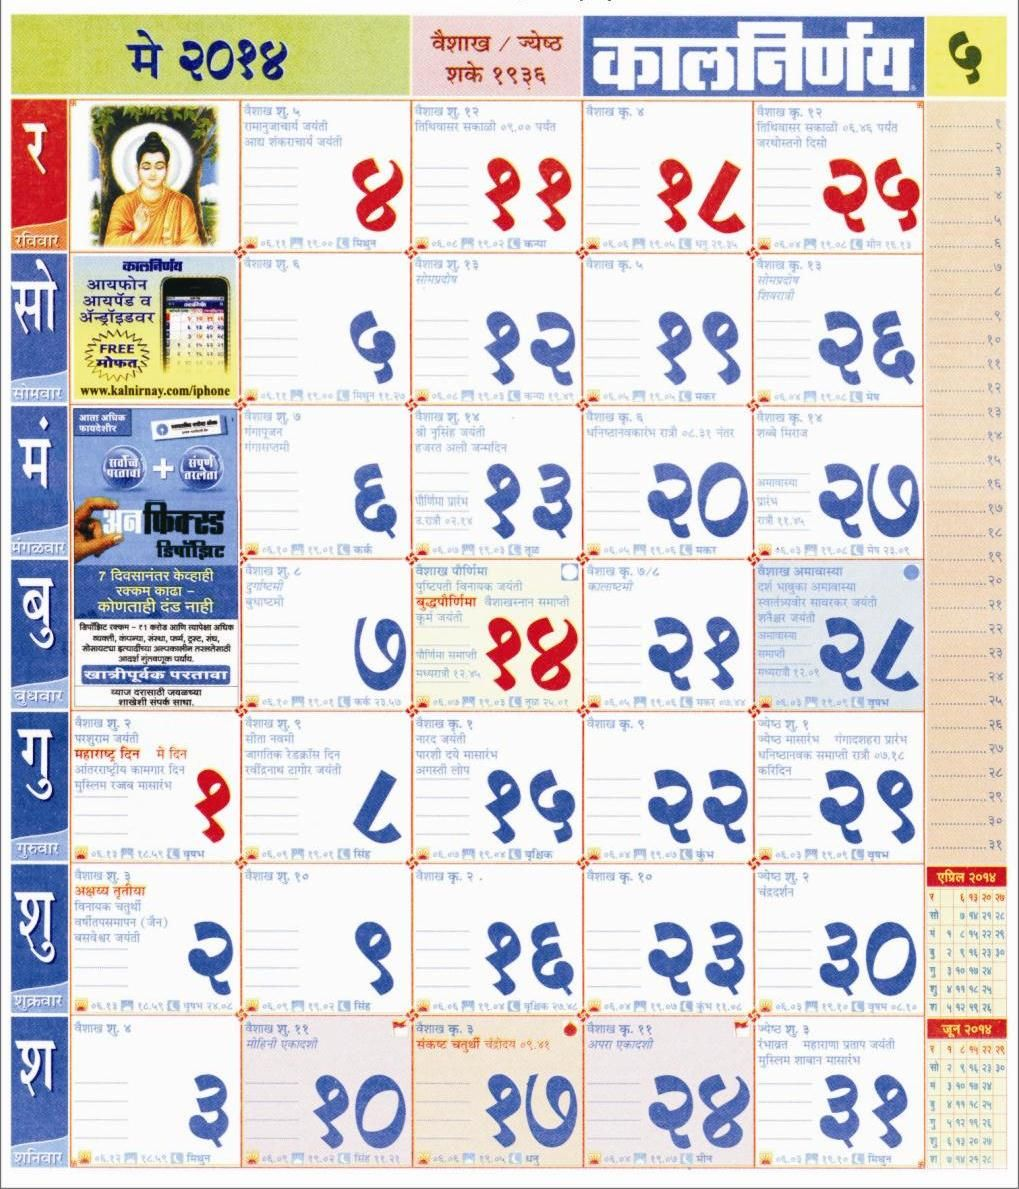 Great 100 Free Resume Builder Tiny 1099 Template Excel Square 15 Year Old Resume Sample 2 Page Resume Design Youthful 2014 Calendar Template Monthly Red2015 Calendar Planner Template Kalnirnay May 2014 Marathi Calendar | Kalnirnay 2014 Calendar ..